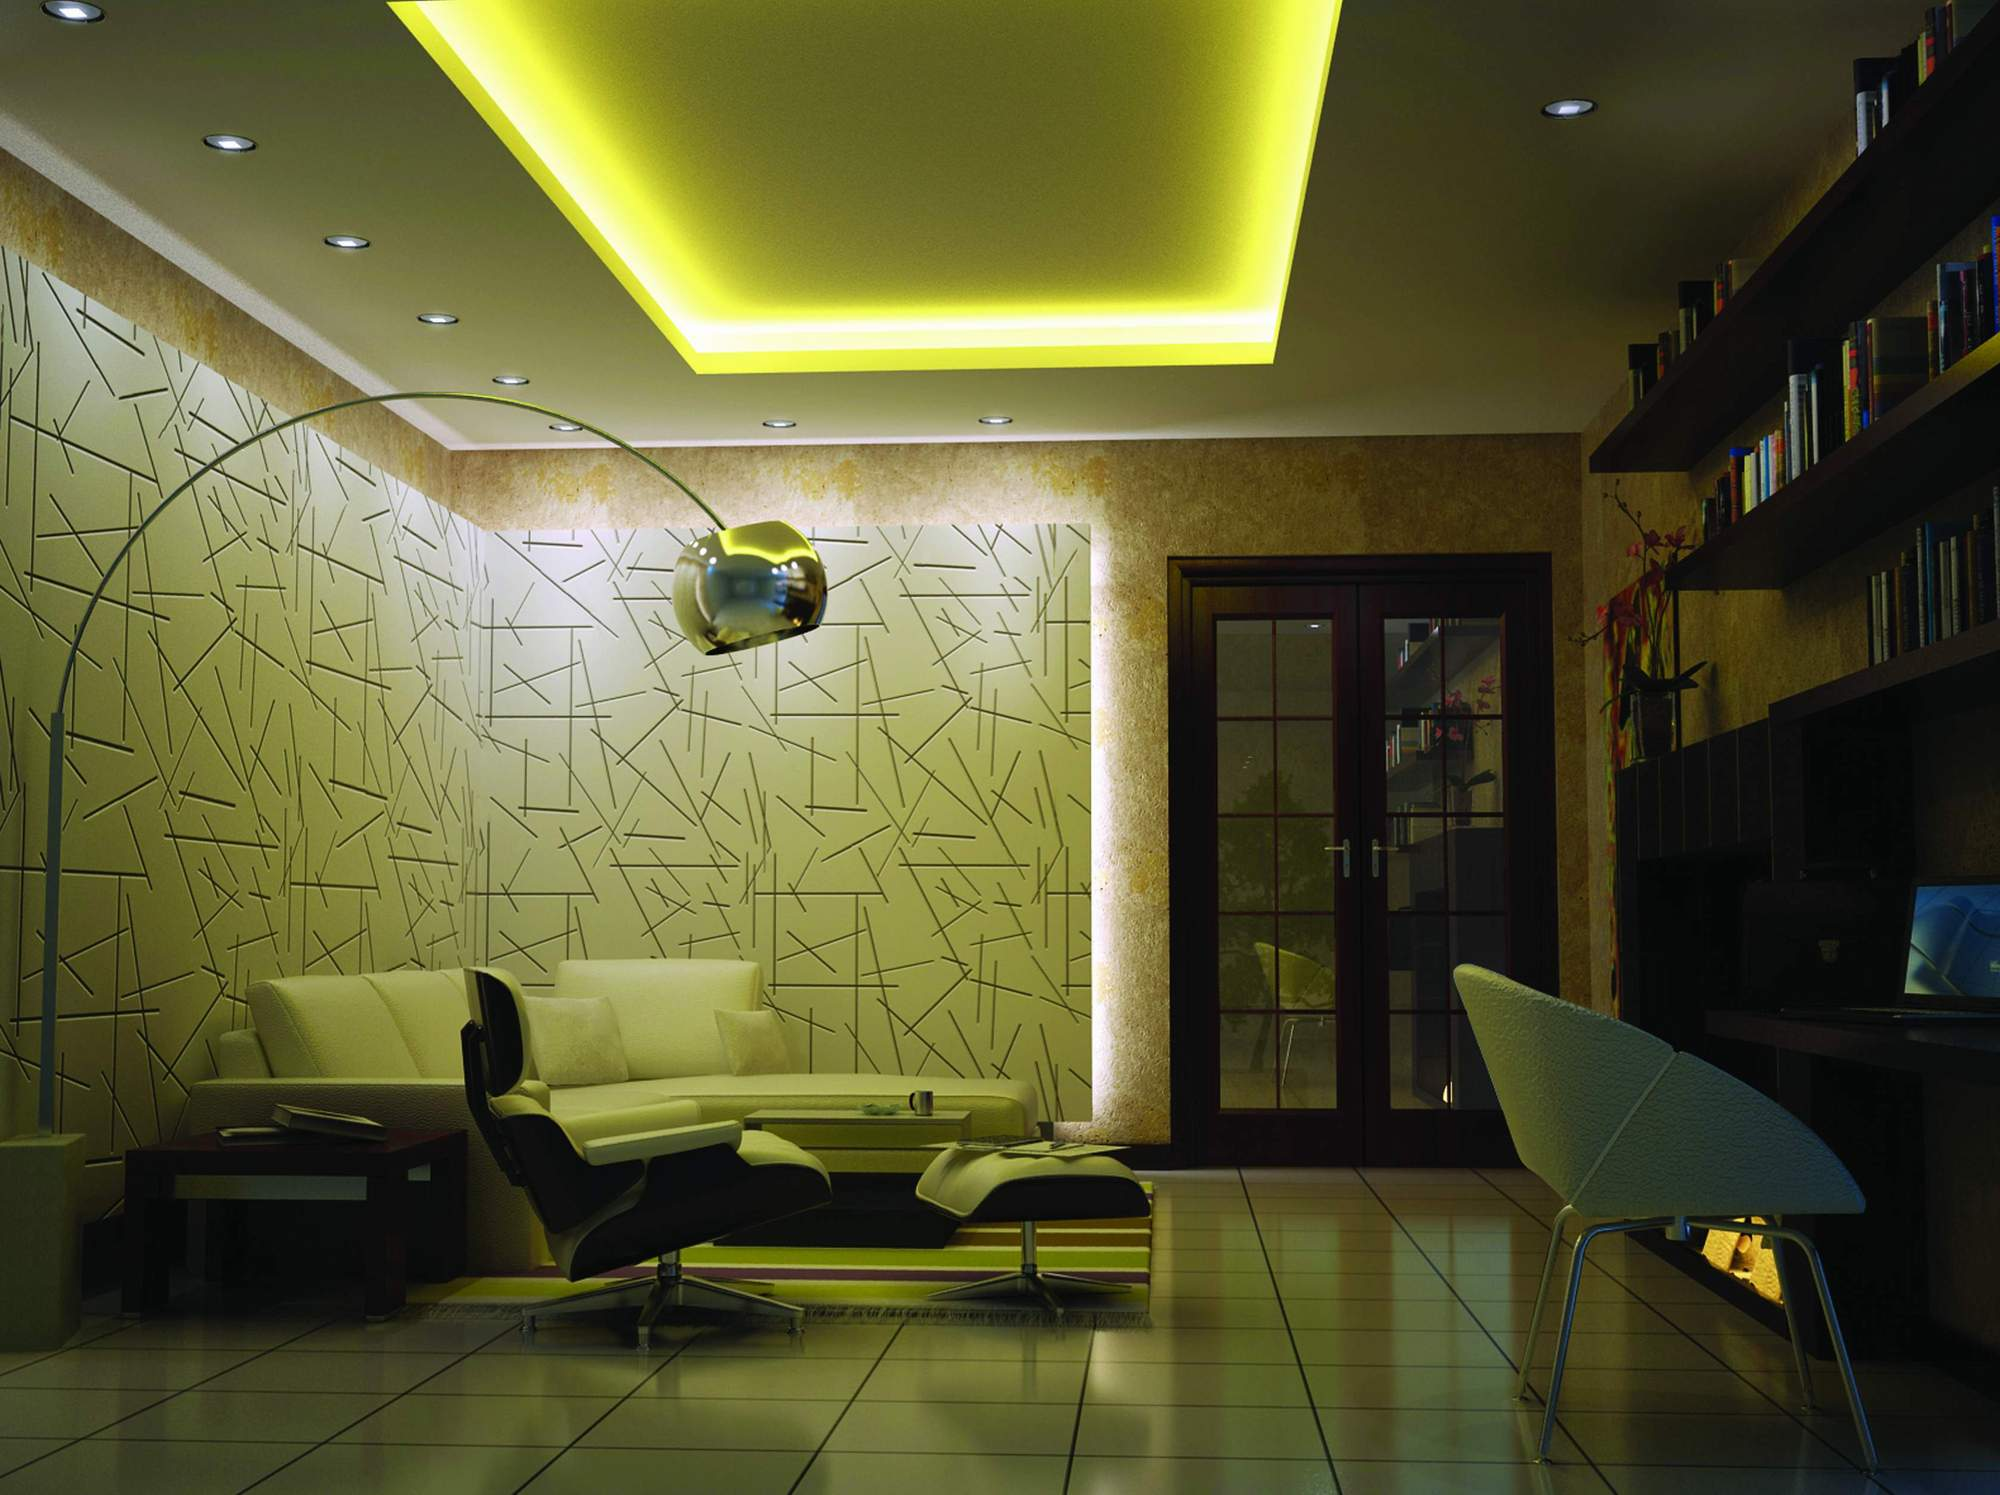 pranto-model-town-interior.jpg